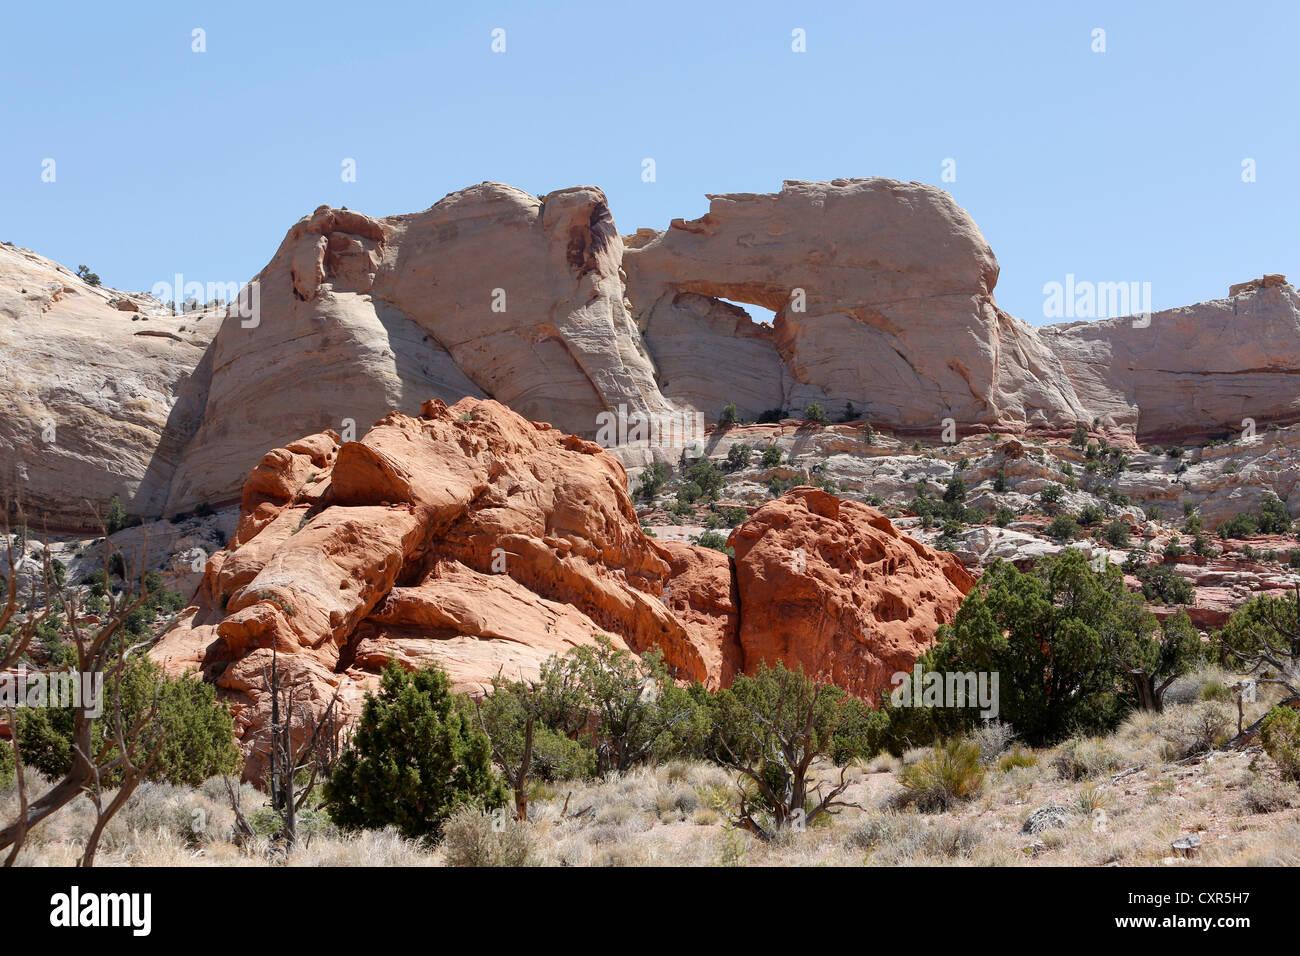 Peekaboo Arch, Upper Muley Twist Canyon, Waterpocket Fold district, Capitol Reef National Park, Utah, USA - Stock Image